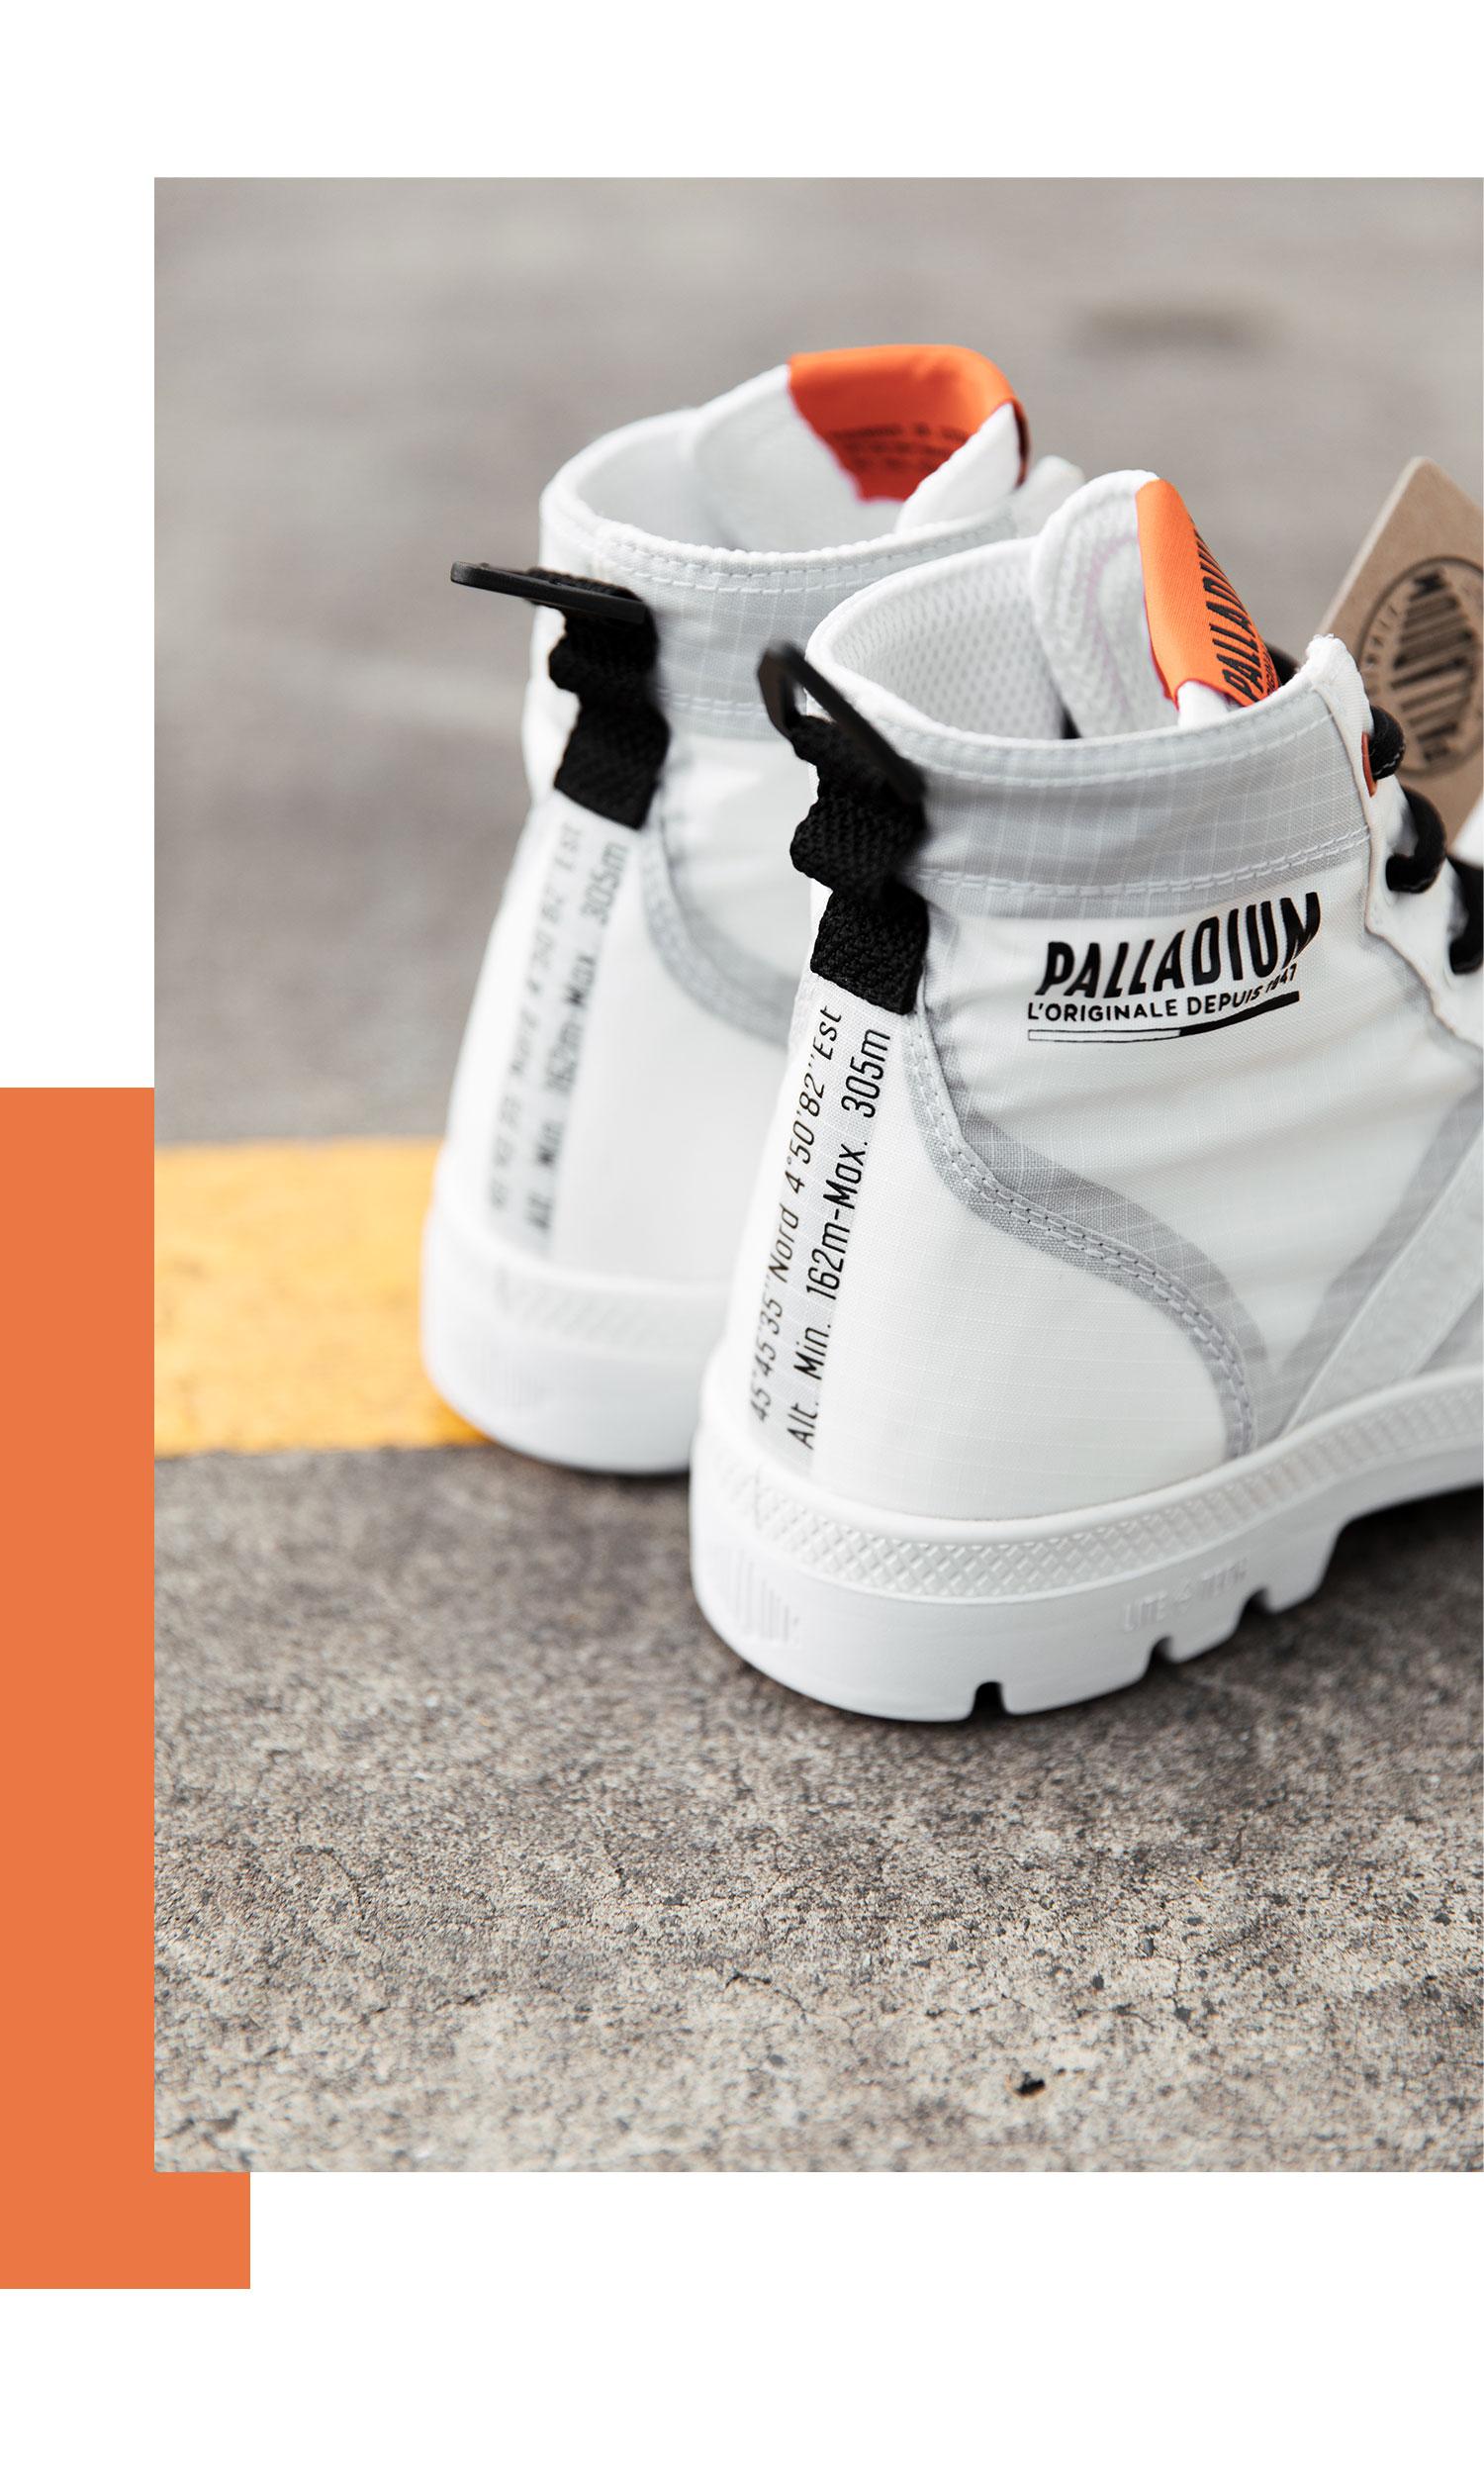 jaheb_barnett_mens_fashion_blogger_auckland_new_zealand_platypus_palladium